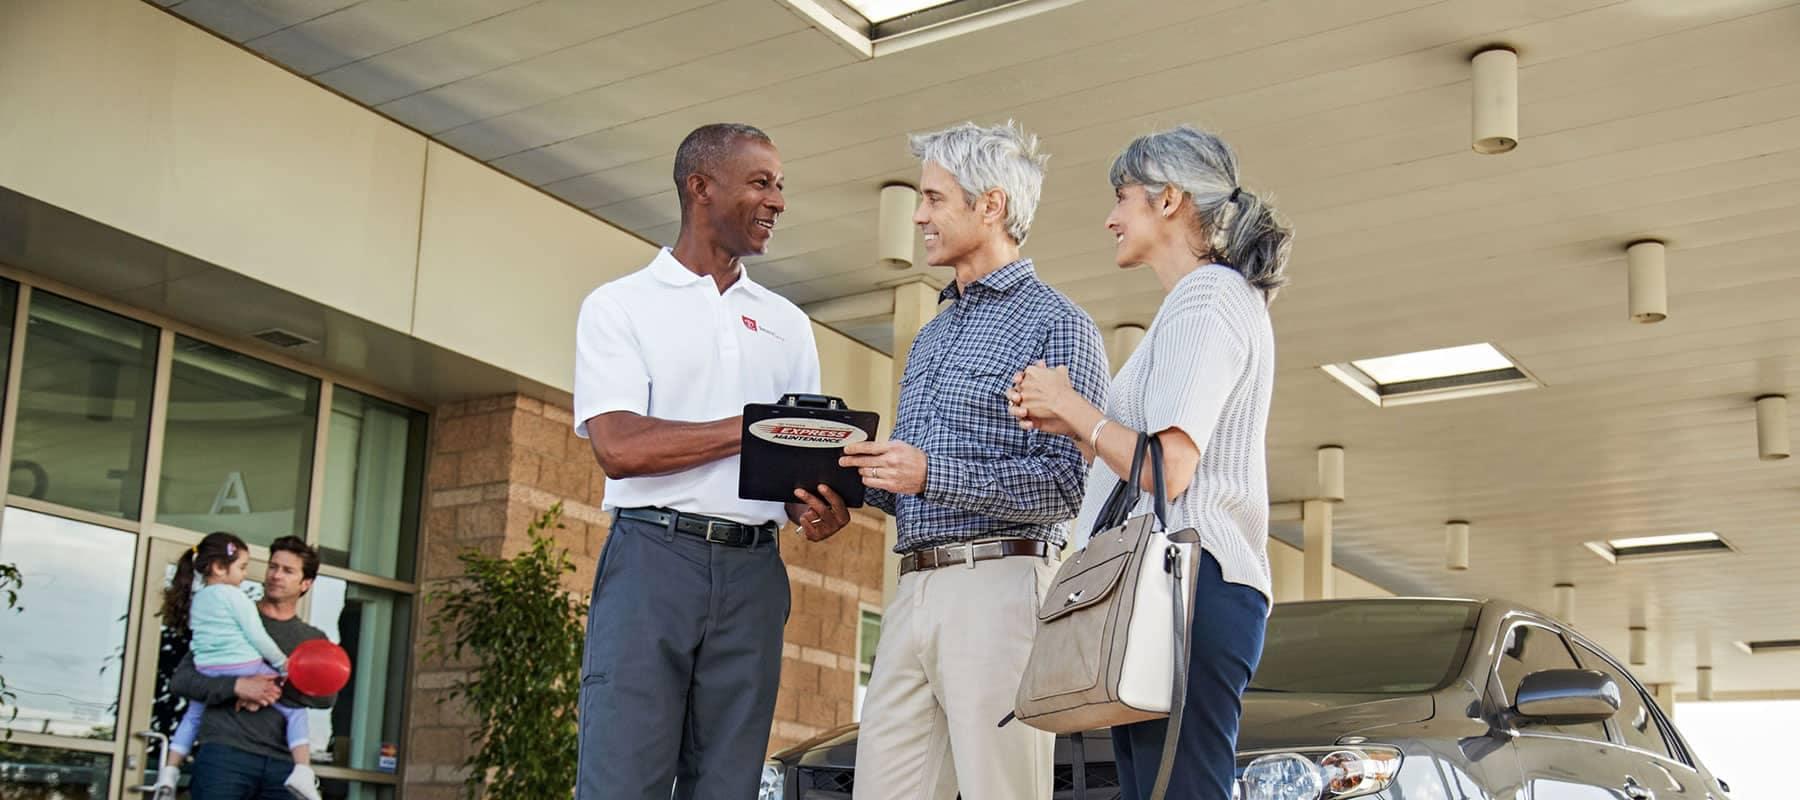 service technician speaks with older couple